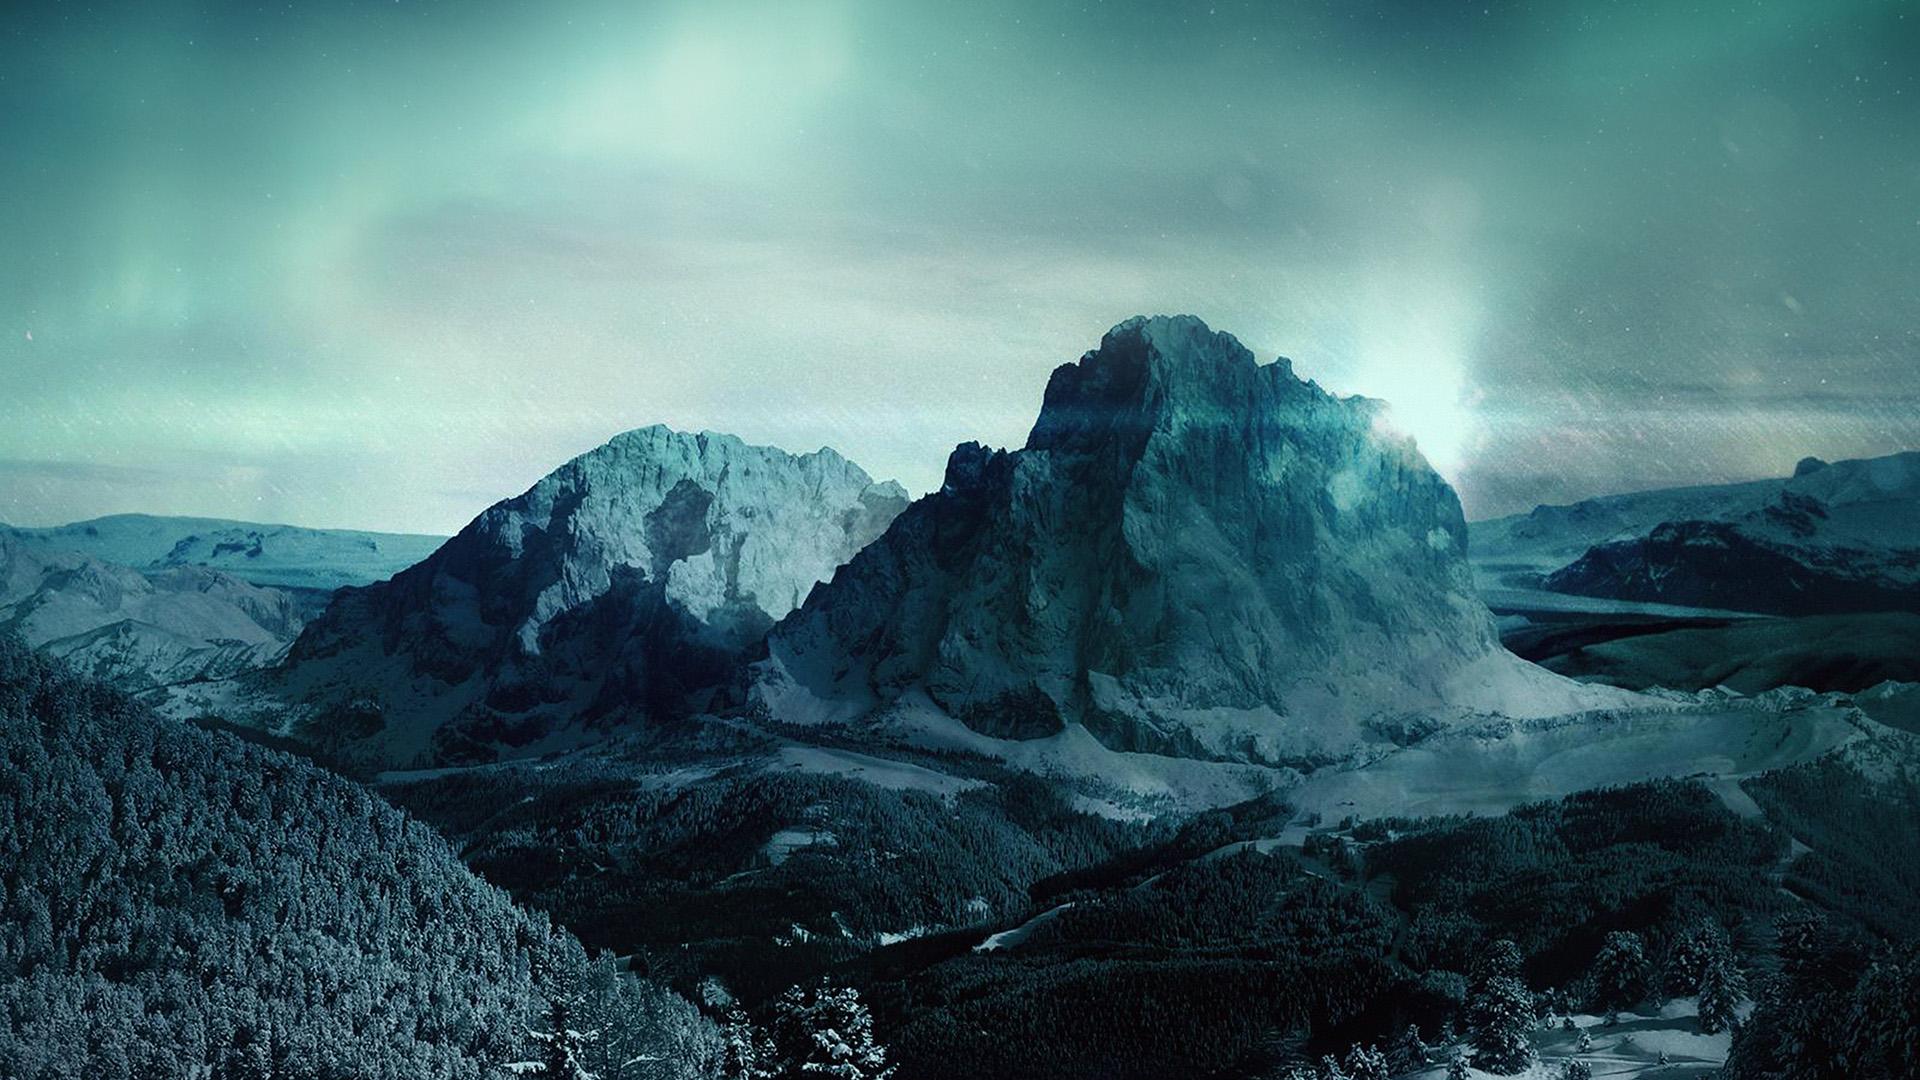 Manly Fall Wallpaper My98 Night Sky Mountain Snow Winter Aurora Wallpaper